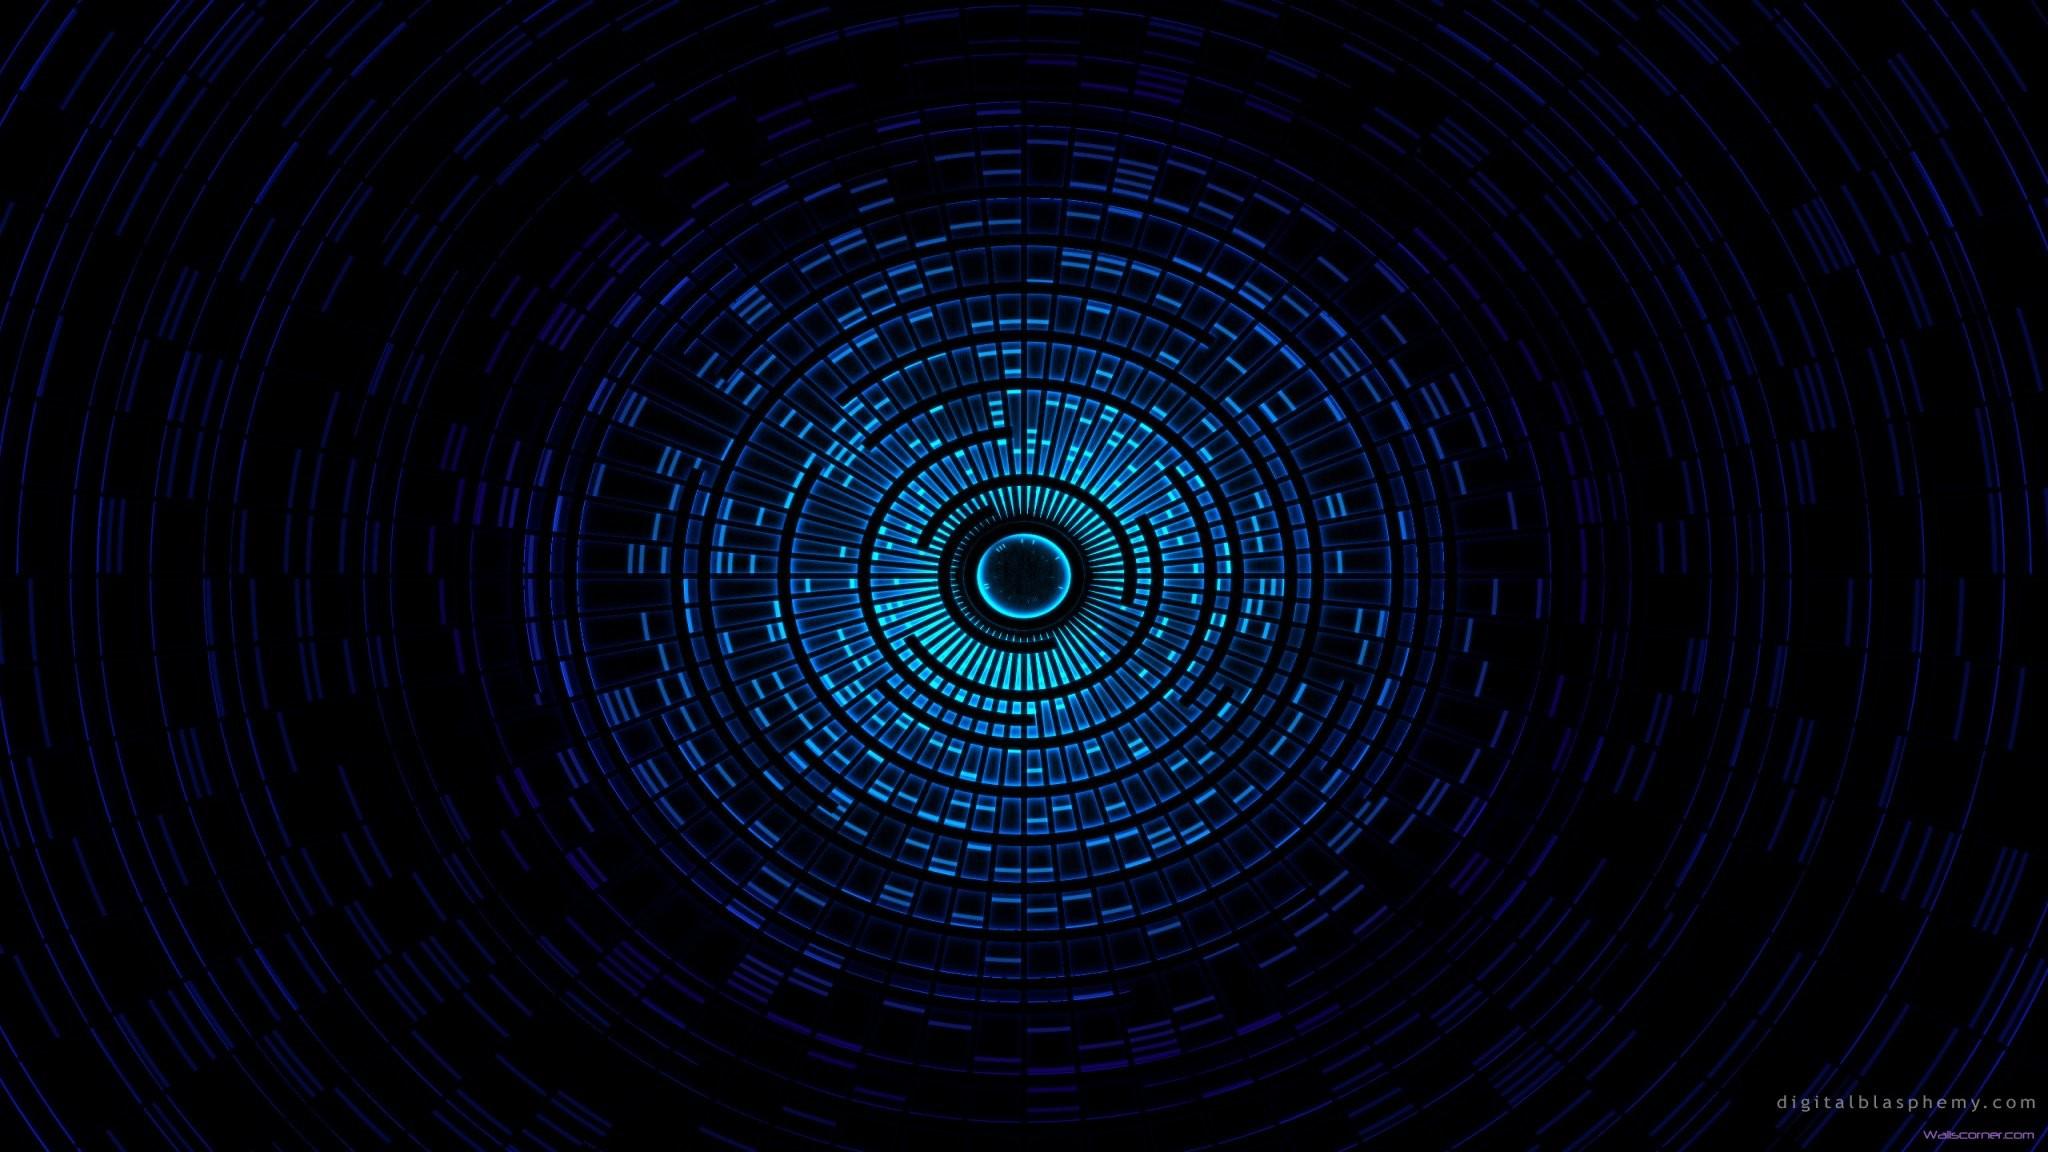 Blue And Black Iphone Wallpaper 4 Widescreen Wallpaper. Blue And Black  Iphone Wallpaper 4 Widescreen Wallpaper